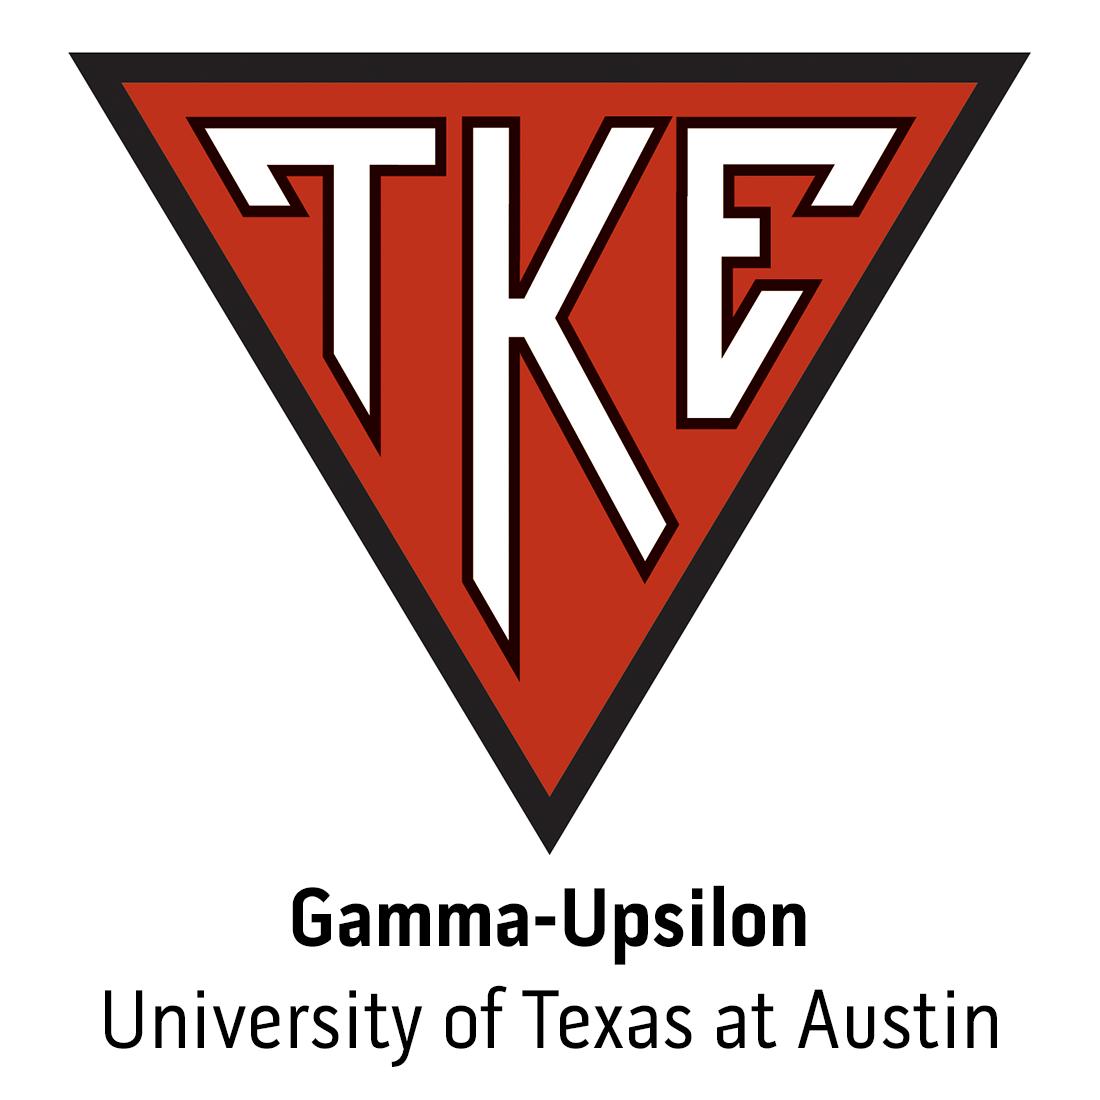 Gamma-Upsilon Chapter at University of Texas at Austin